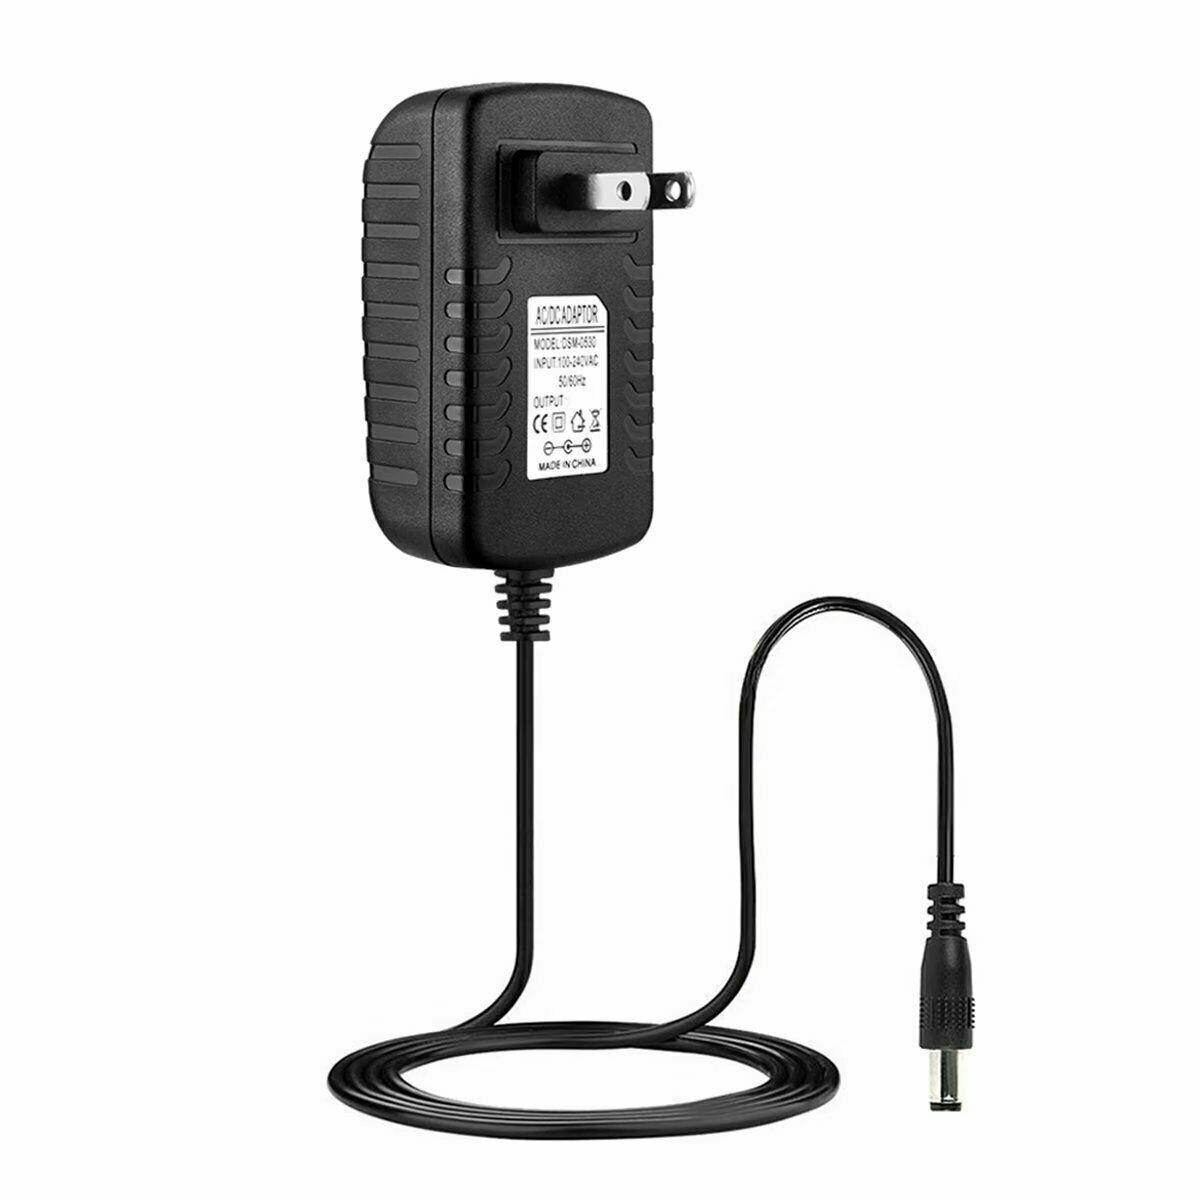 7.2V-Li For the: DREMEL 8050-35 MICRO Cordless Tool DREMEL ® Battery Charger